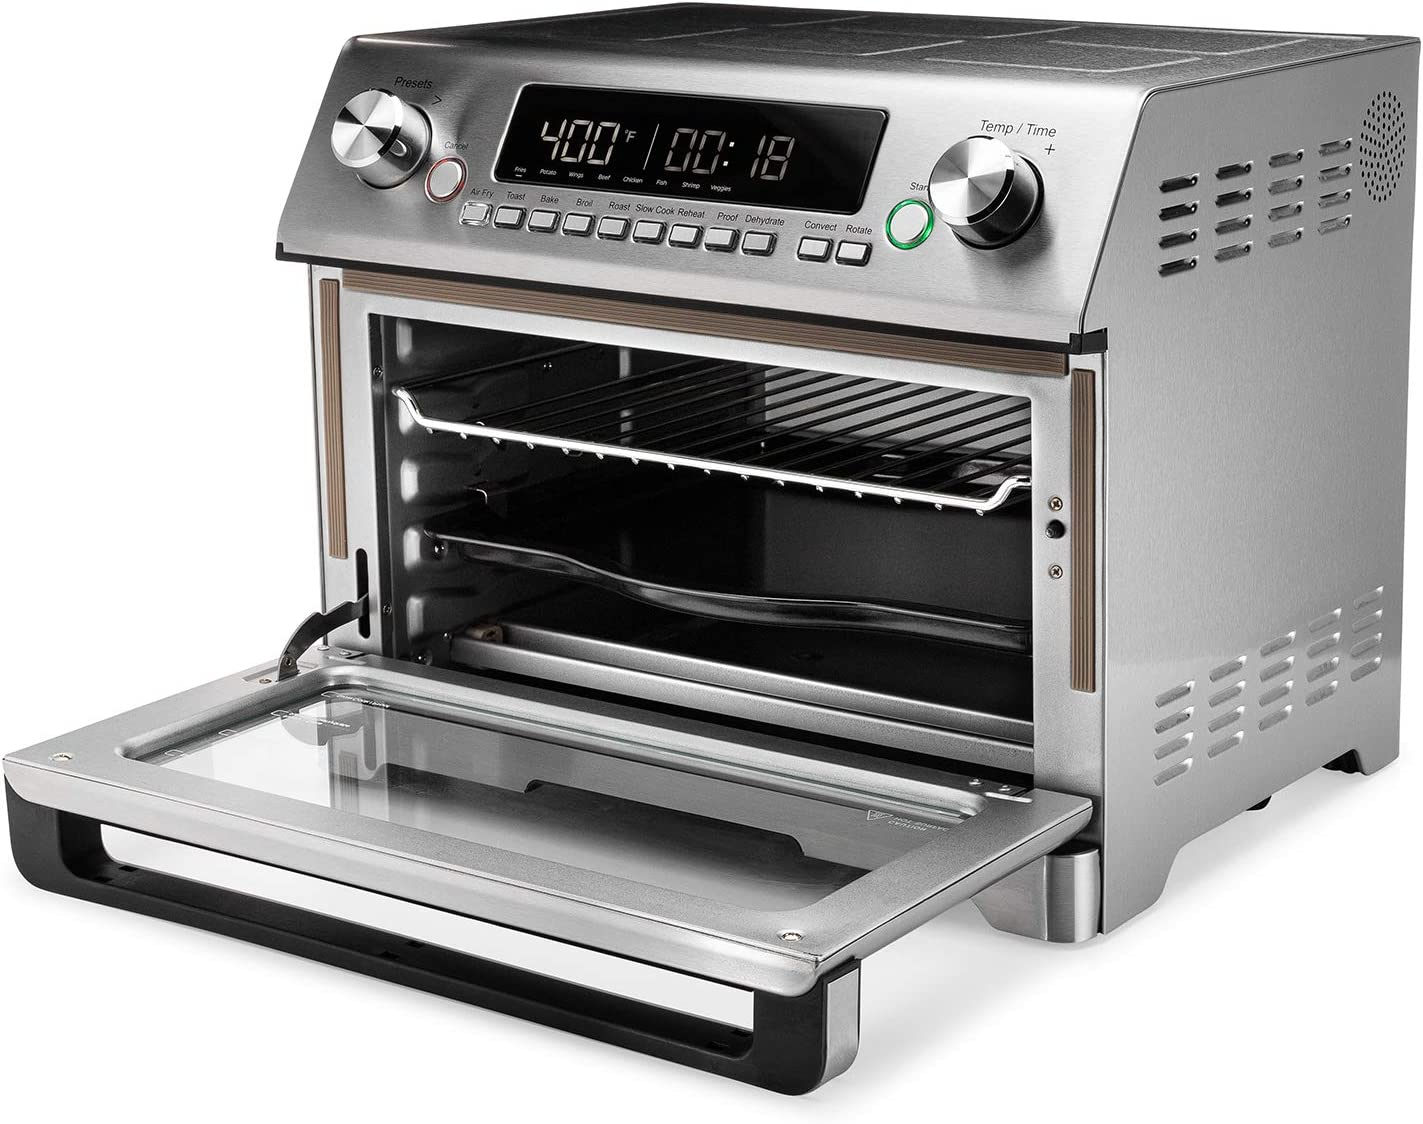 Costco Gourmia Air Fryer For 59 99 Ymmv Nationwide Page 6